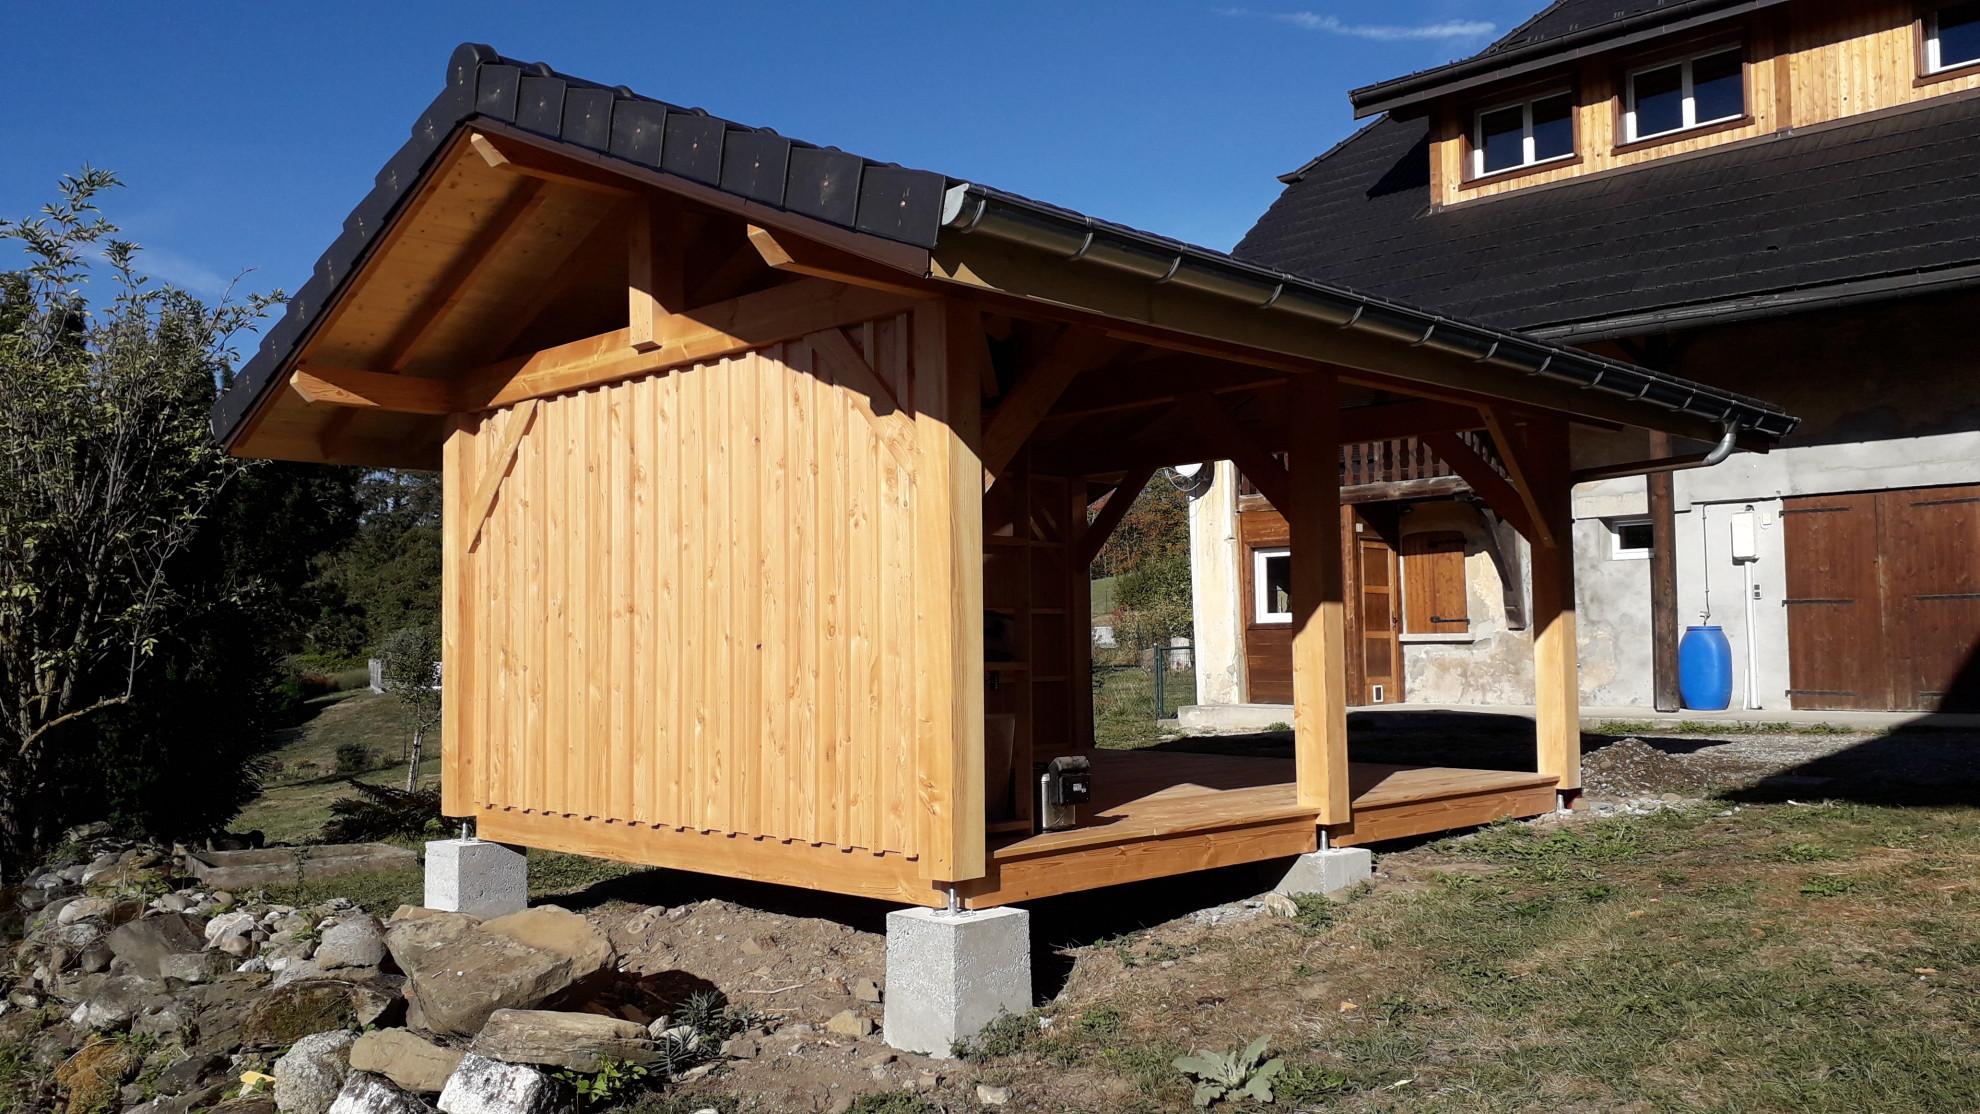 Abri De Jardin En Pin Douglas nbc bois - abri de jardin/terrasse couverte